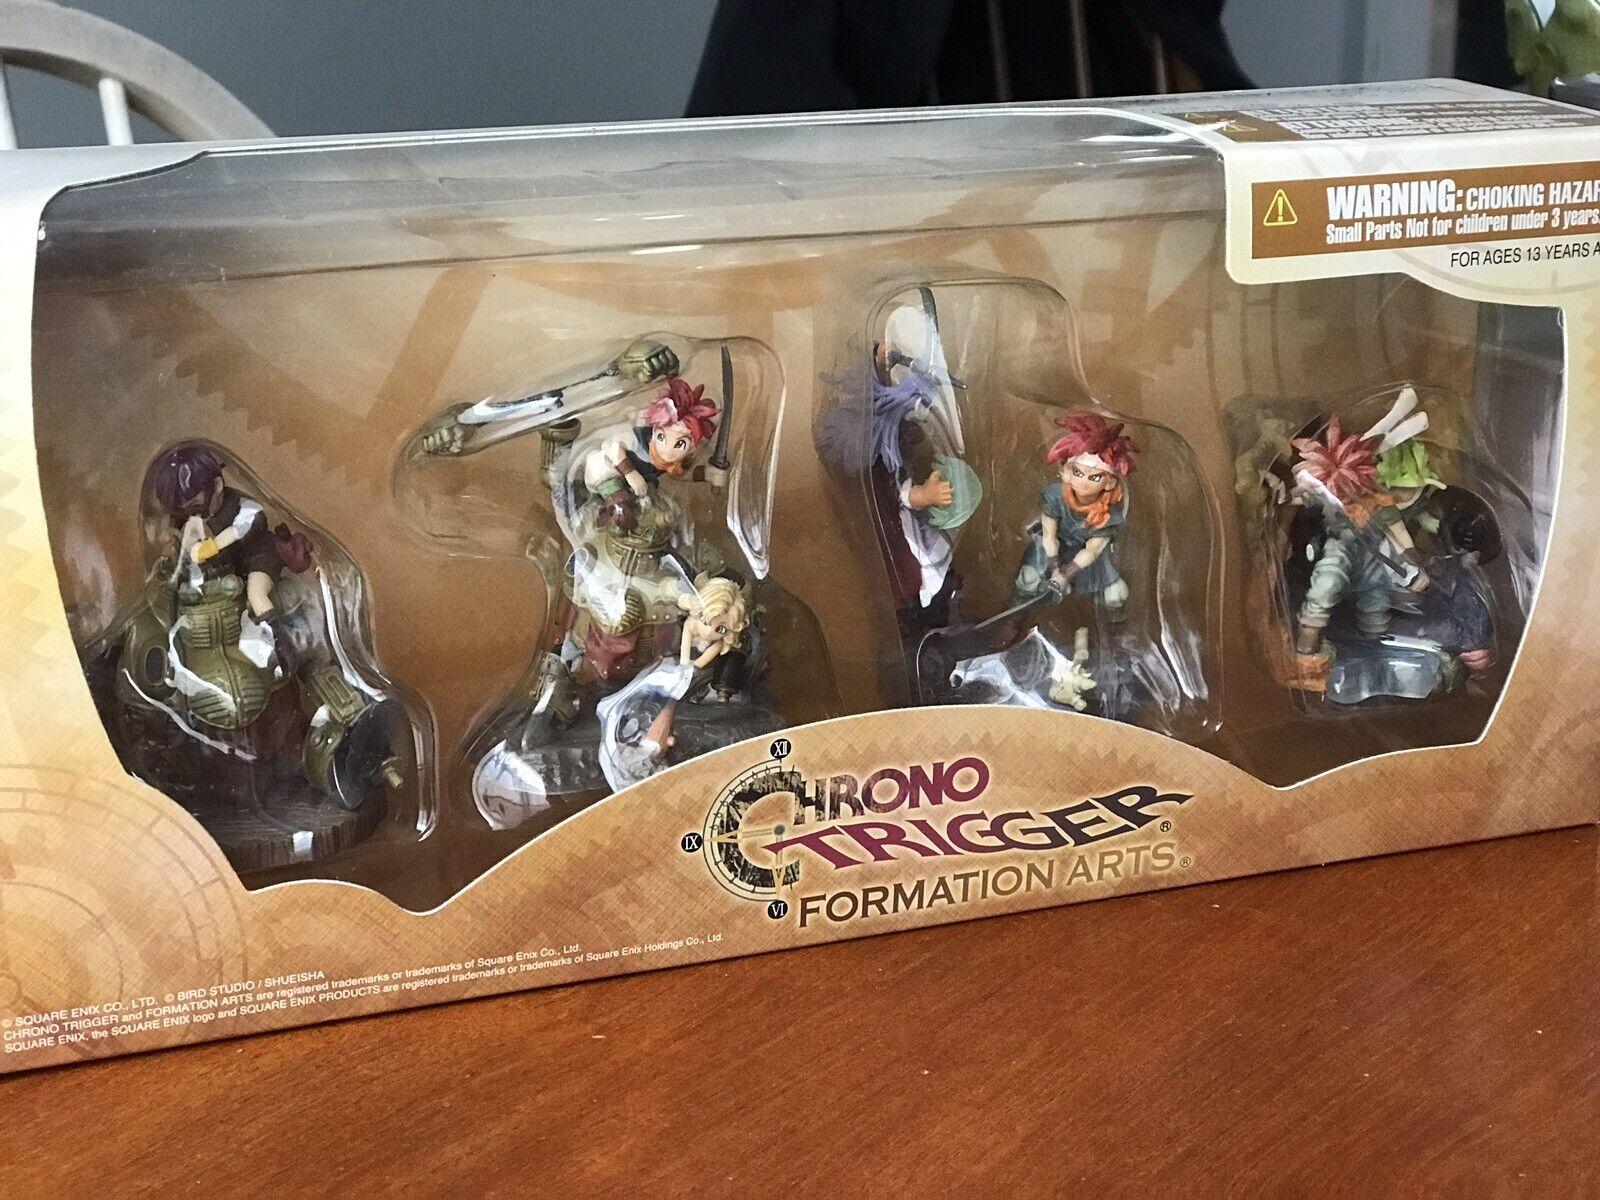 Chrono Trigger Formation Arts Trading Figures Set Of 4 Square Enix NEUF Rare